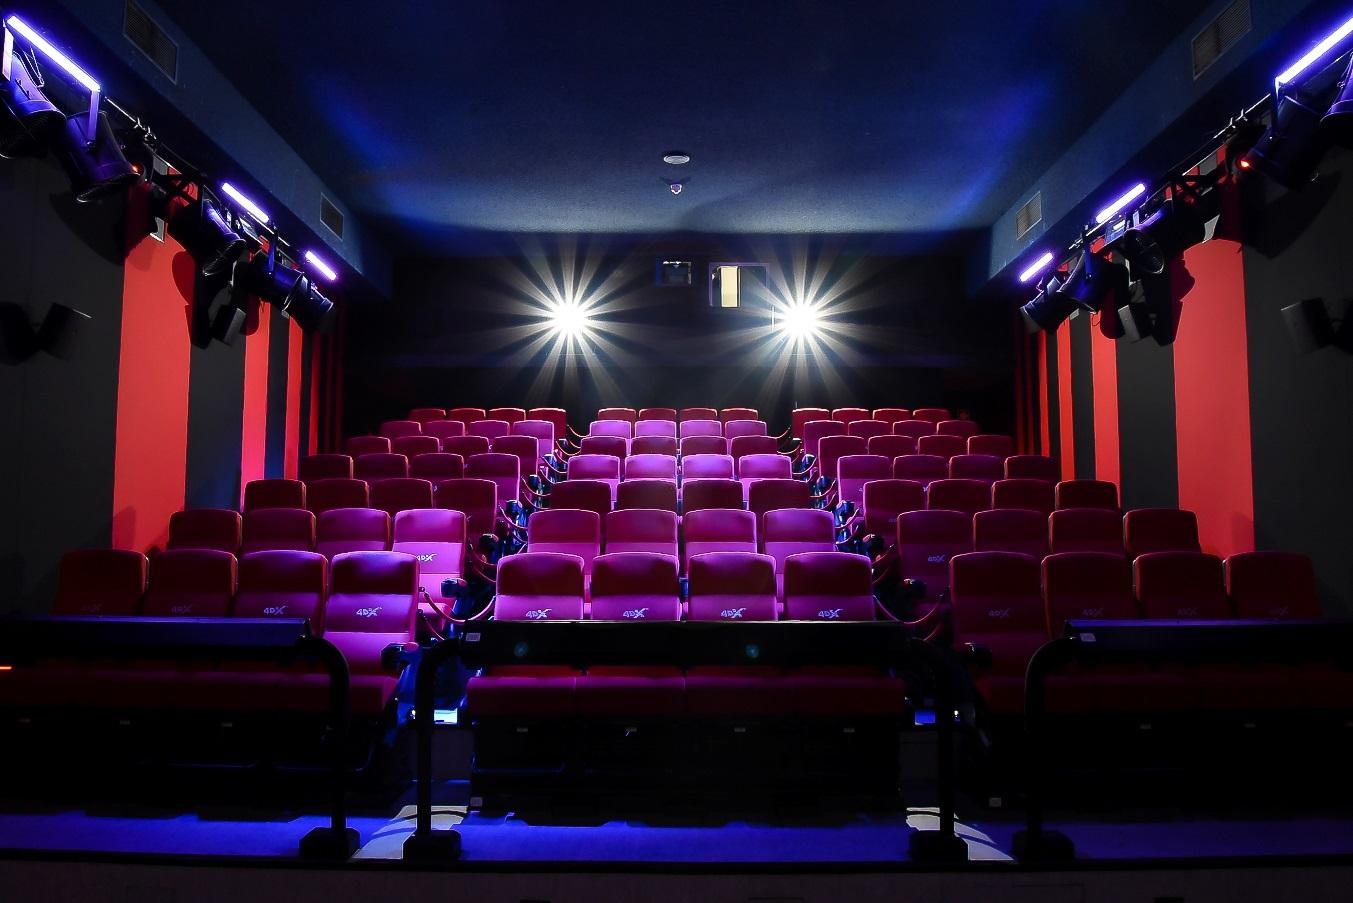 cinema - photo #33